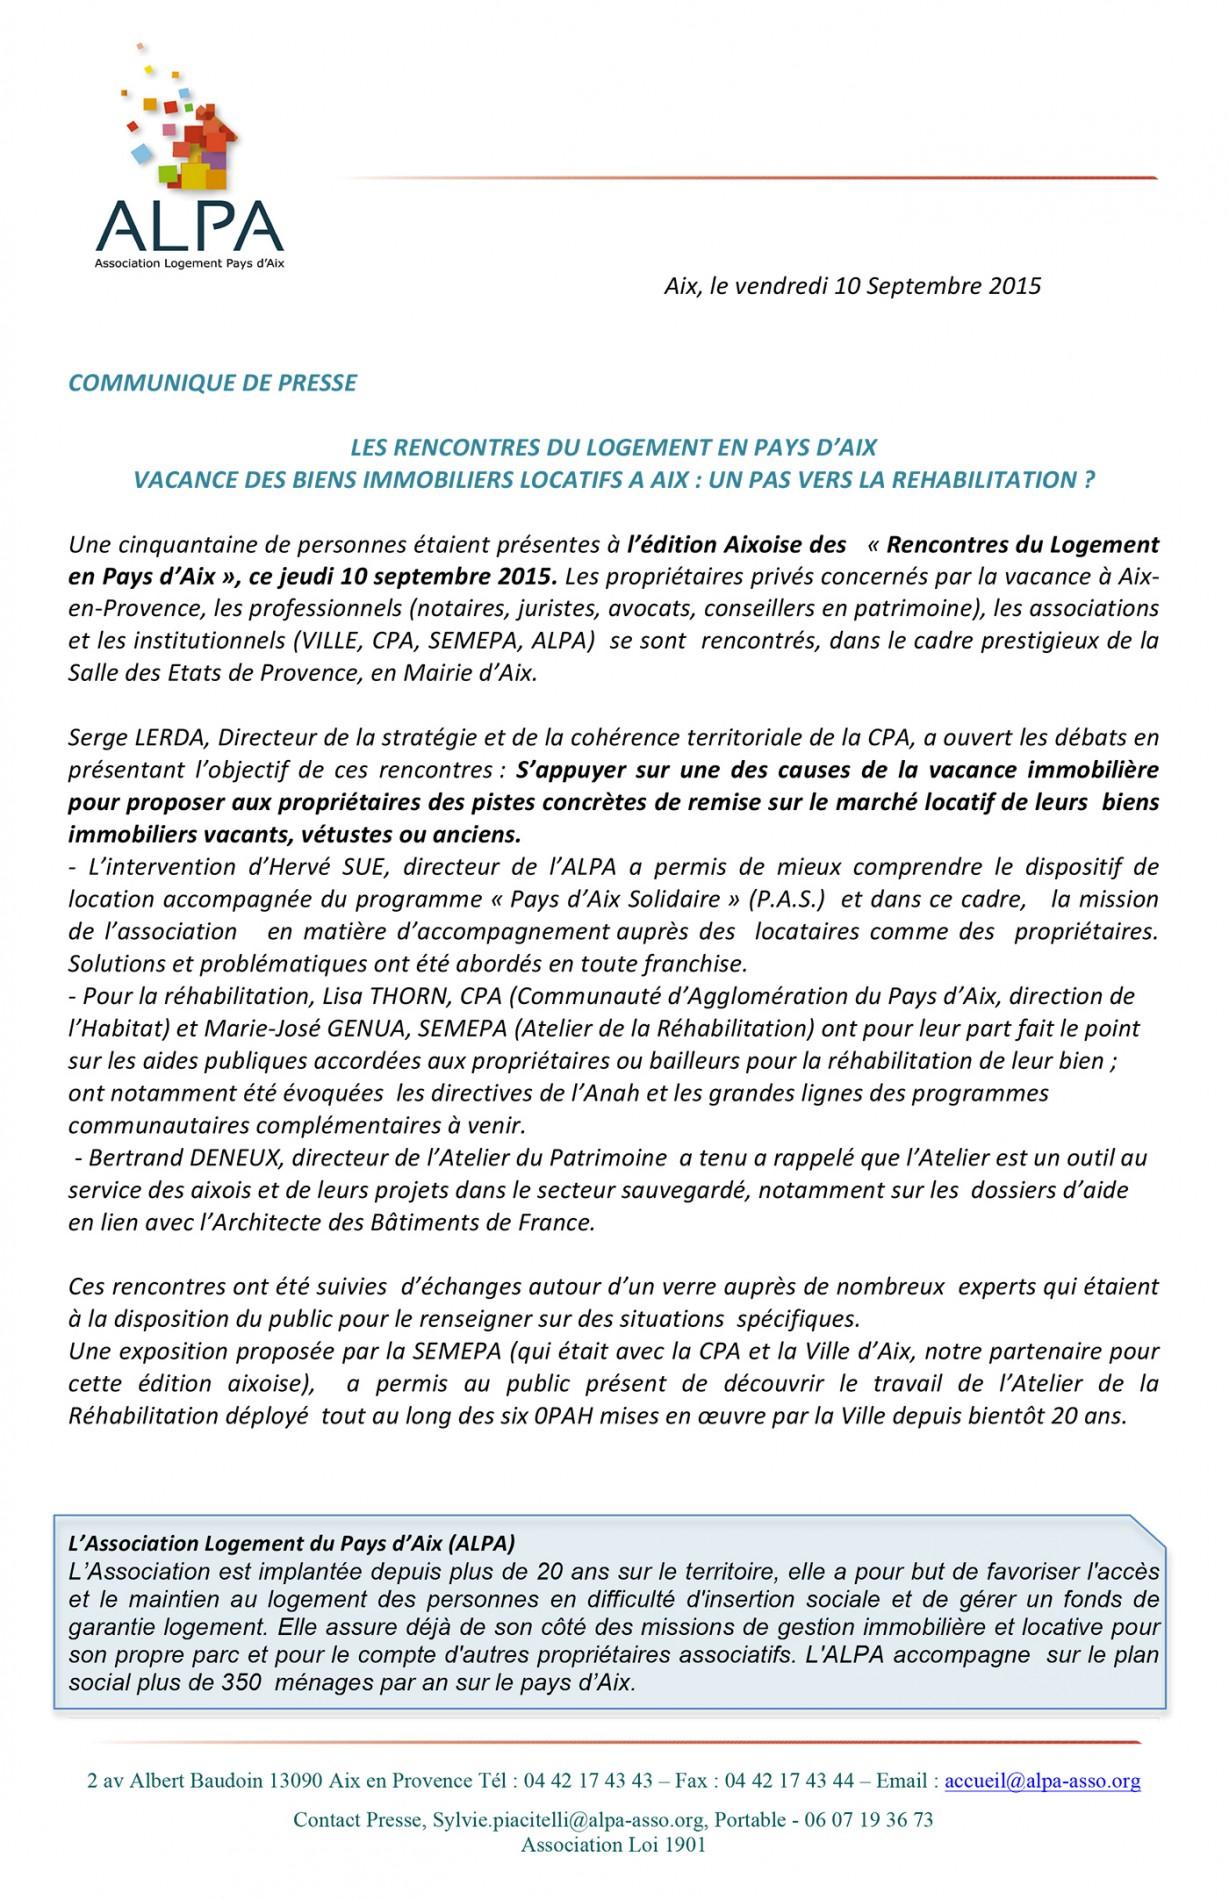 Microsoft Word - Communiqué ALPA- CR10 septembre 2015.doc